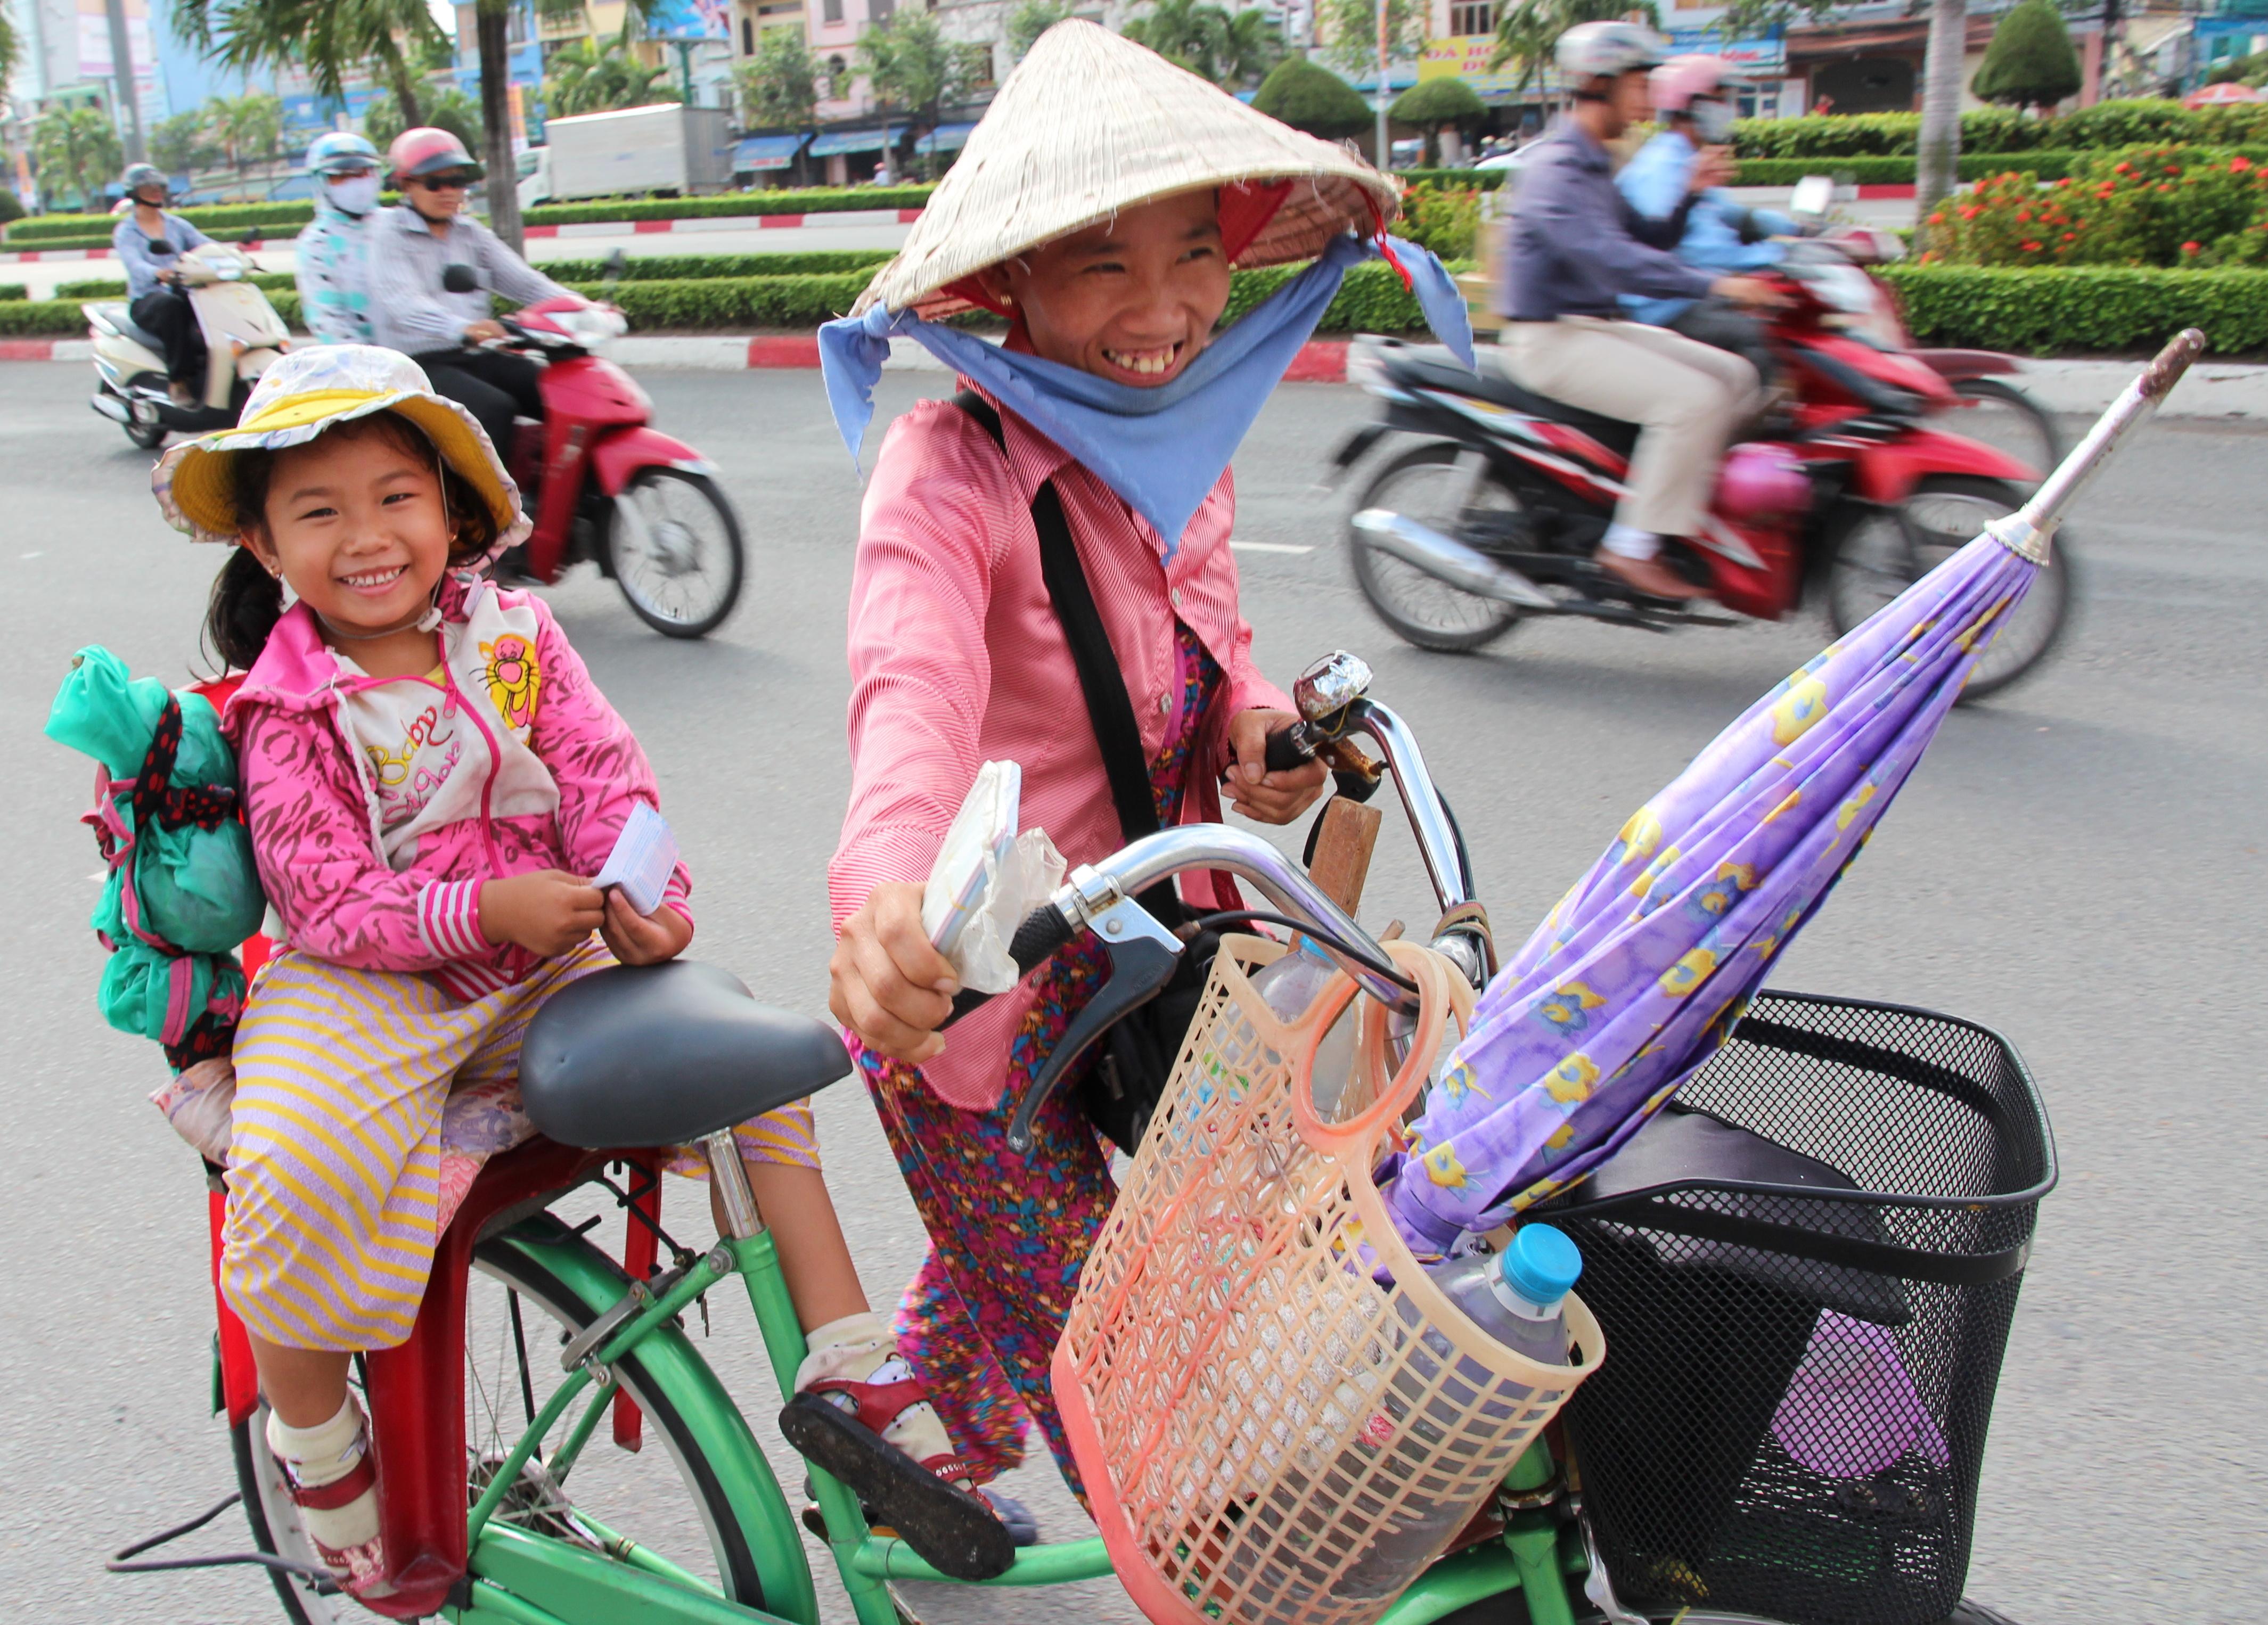 Saying 'yes', 'no' the Vietnamese way